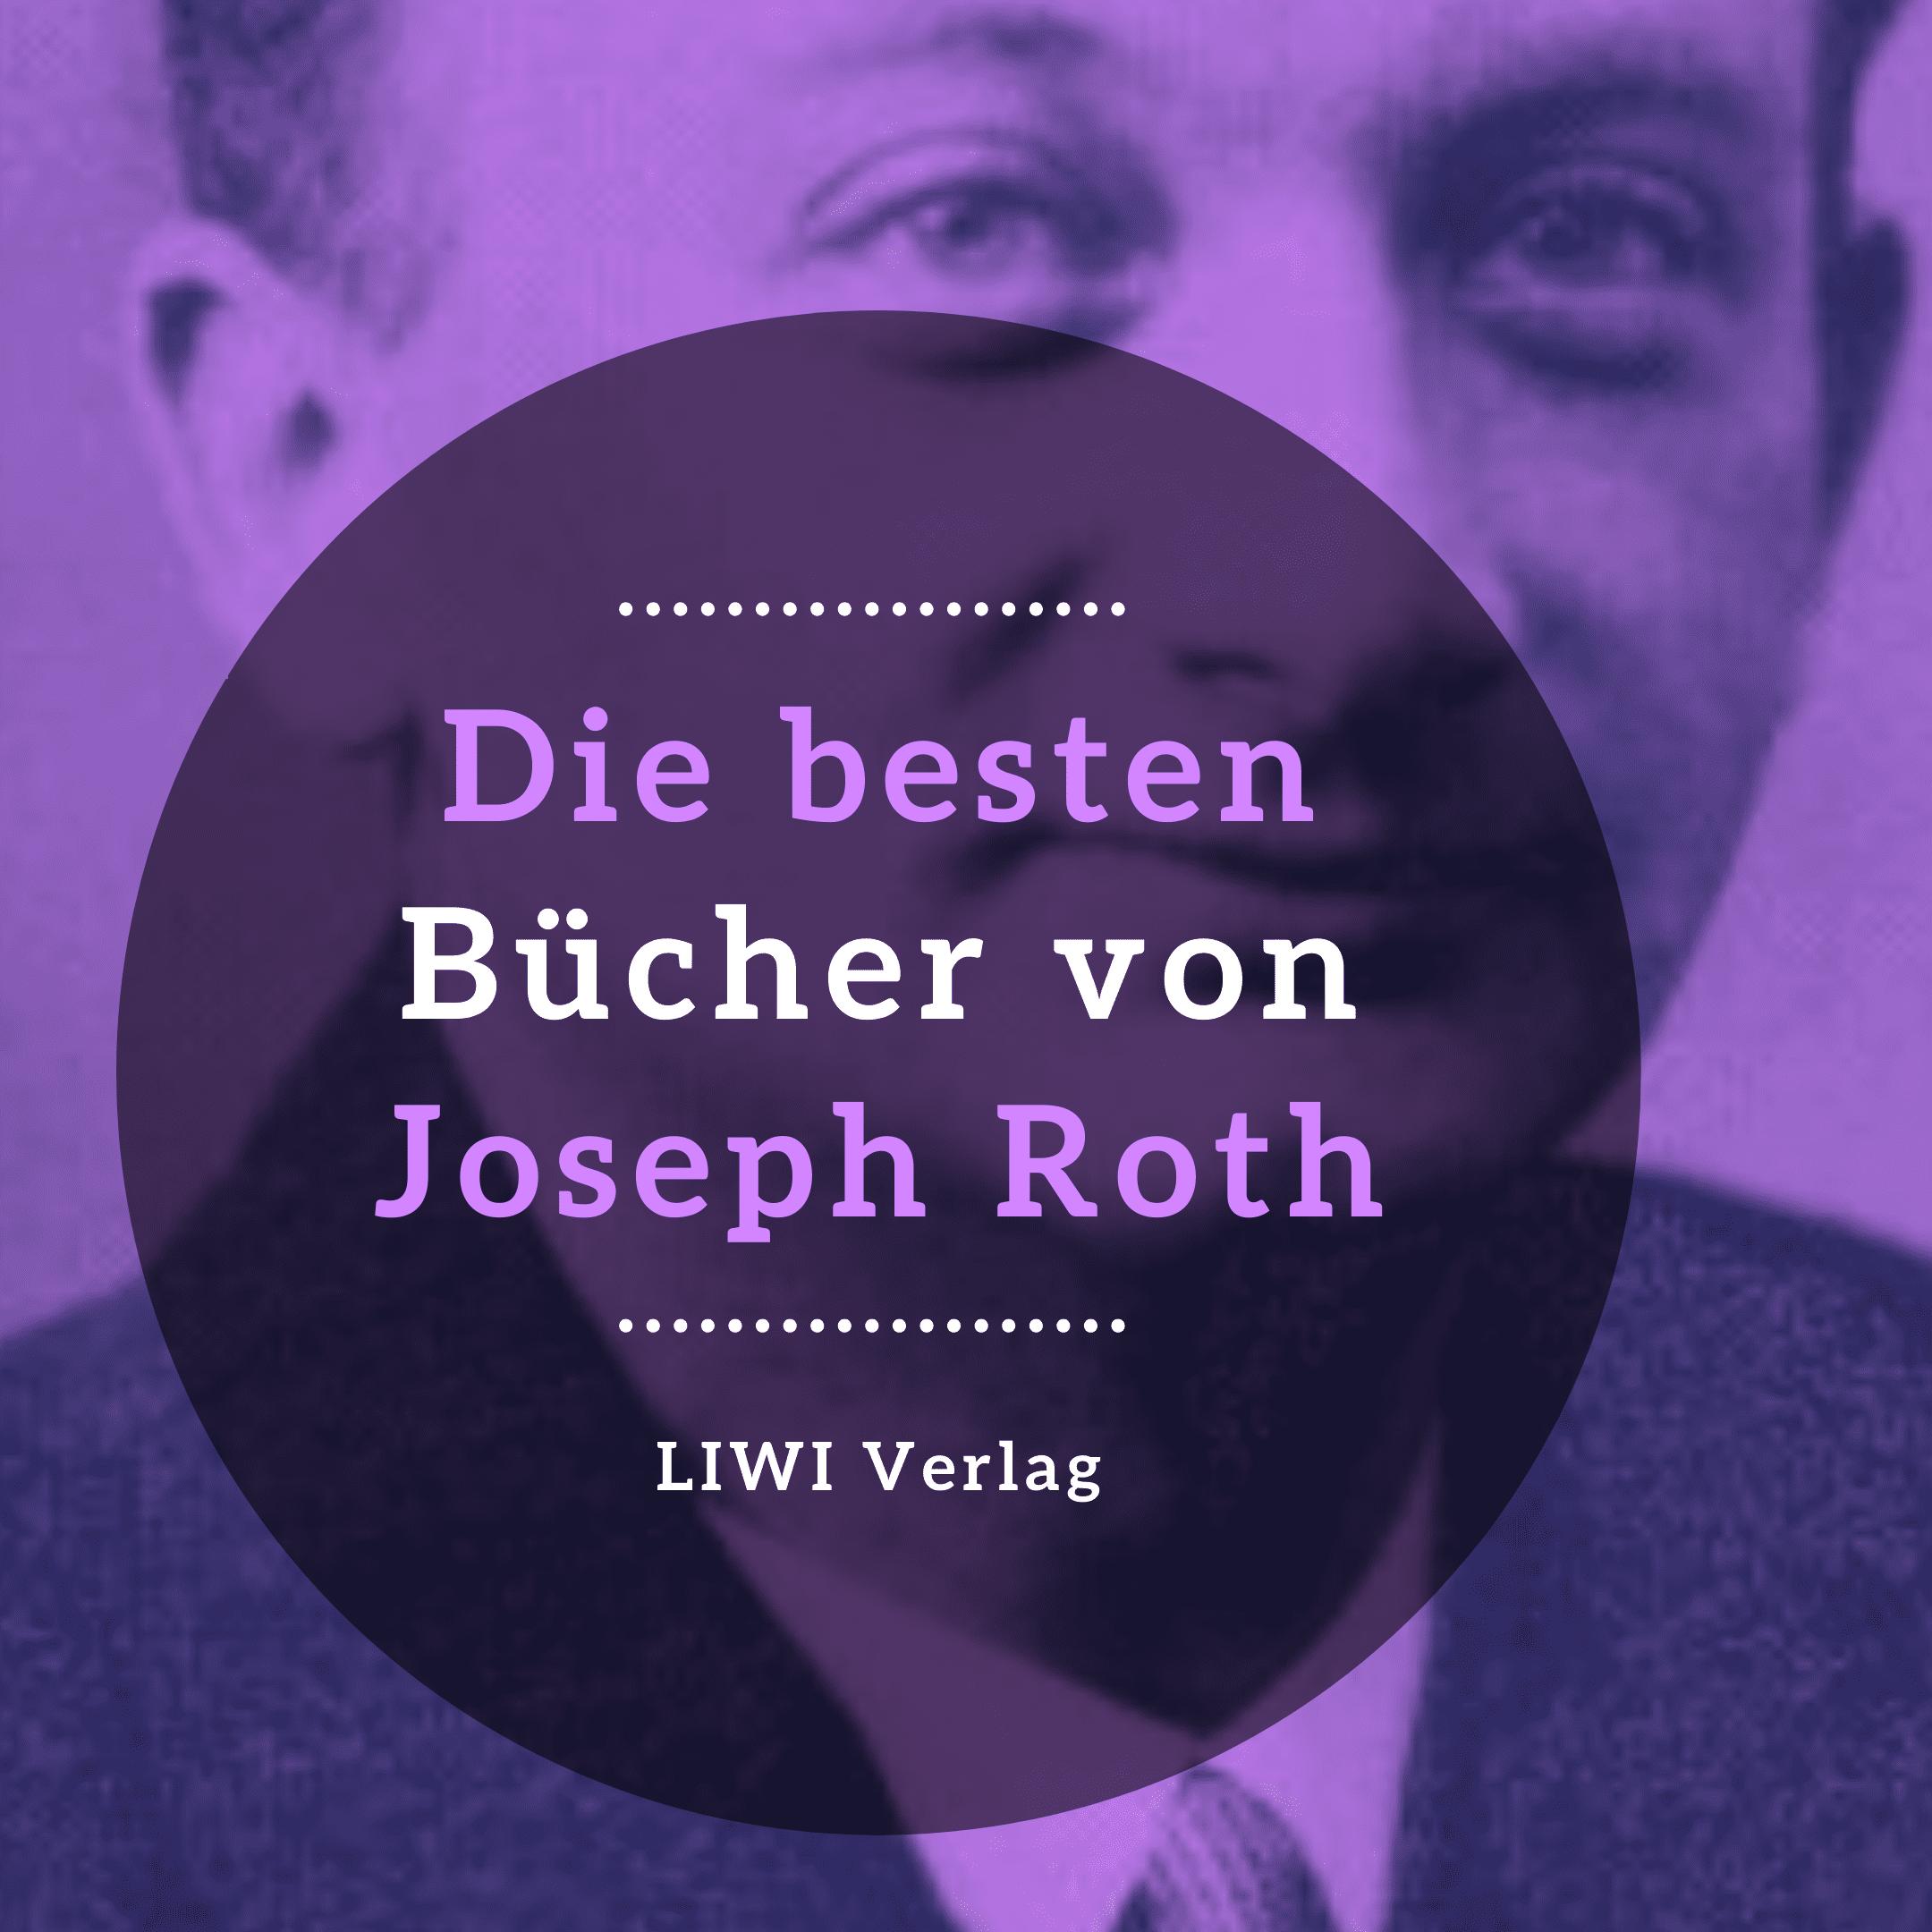 Joseph roth bücher liwi verlag